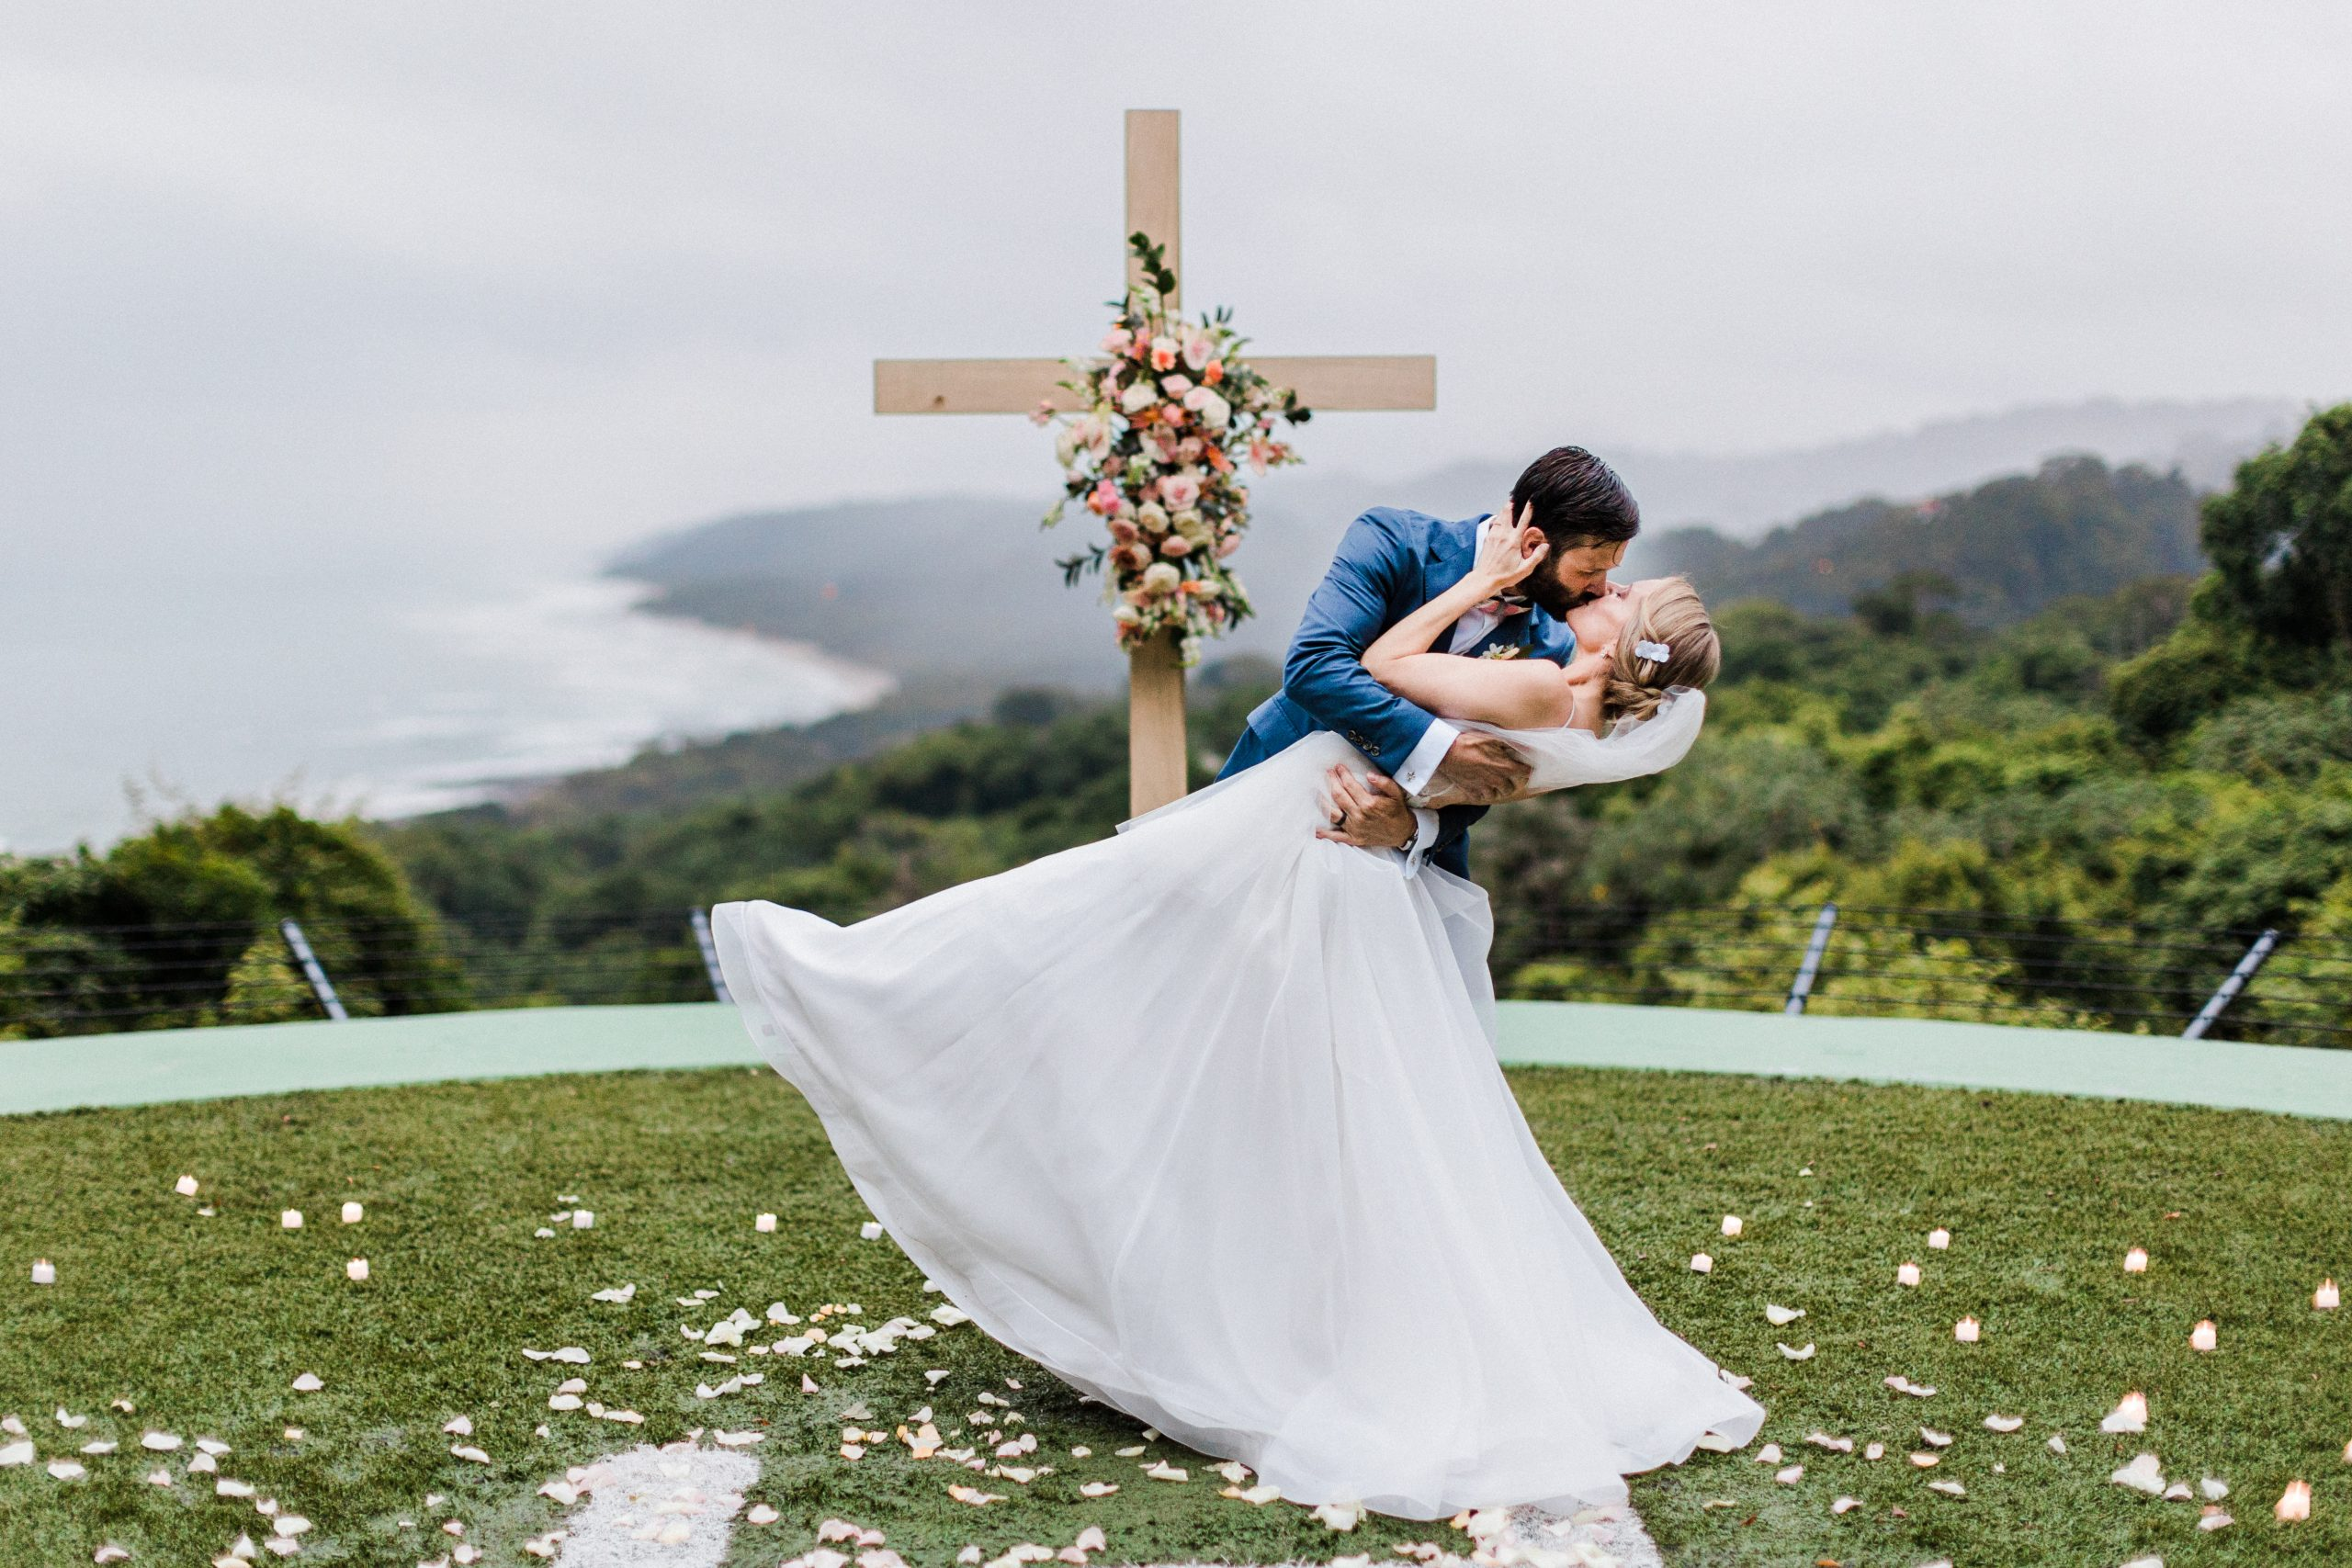 Helipad-Wedding-in-Casa-Cameleon-Costa-Rica